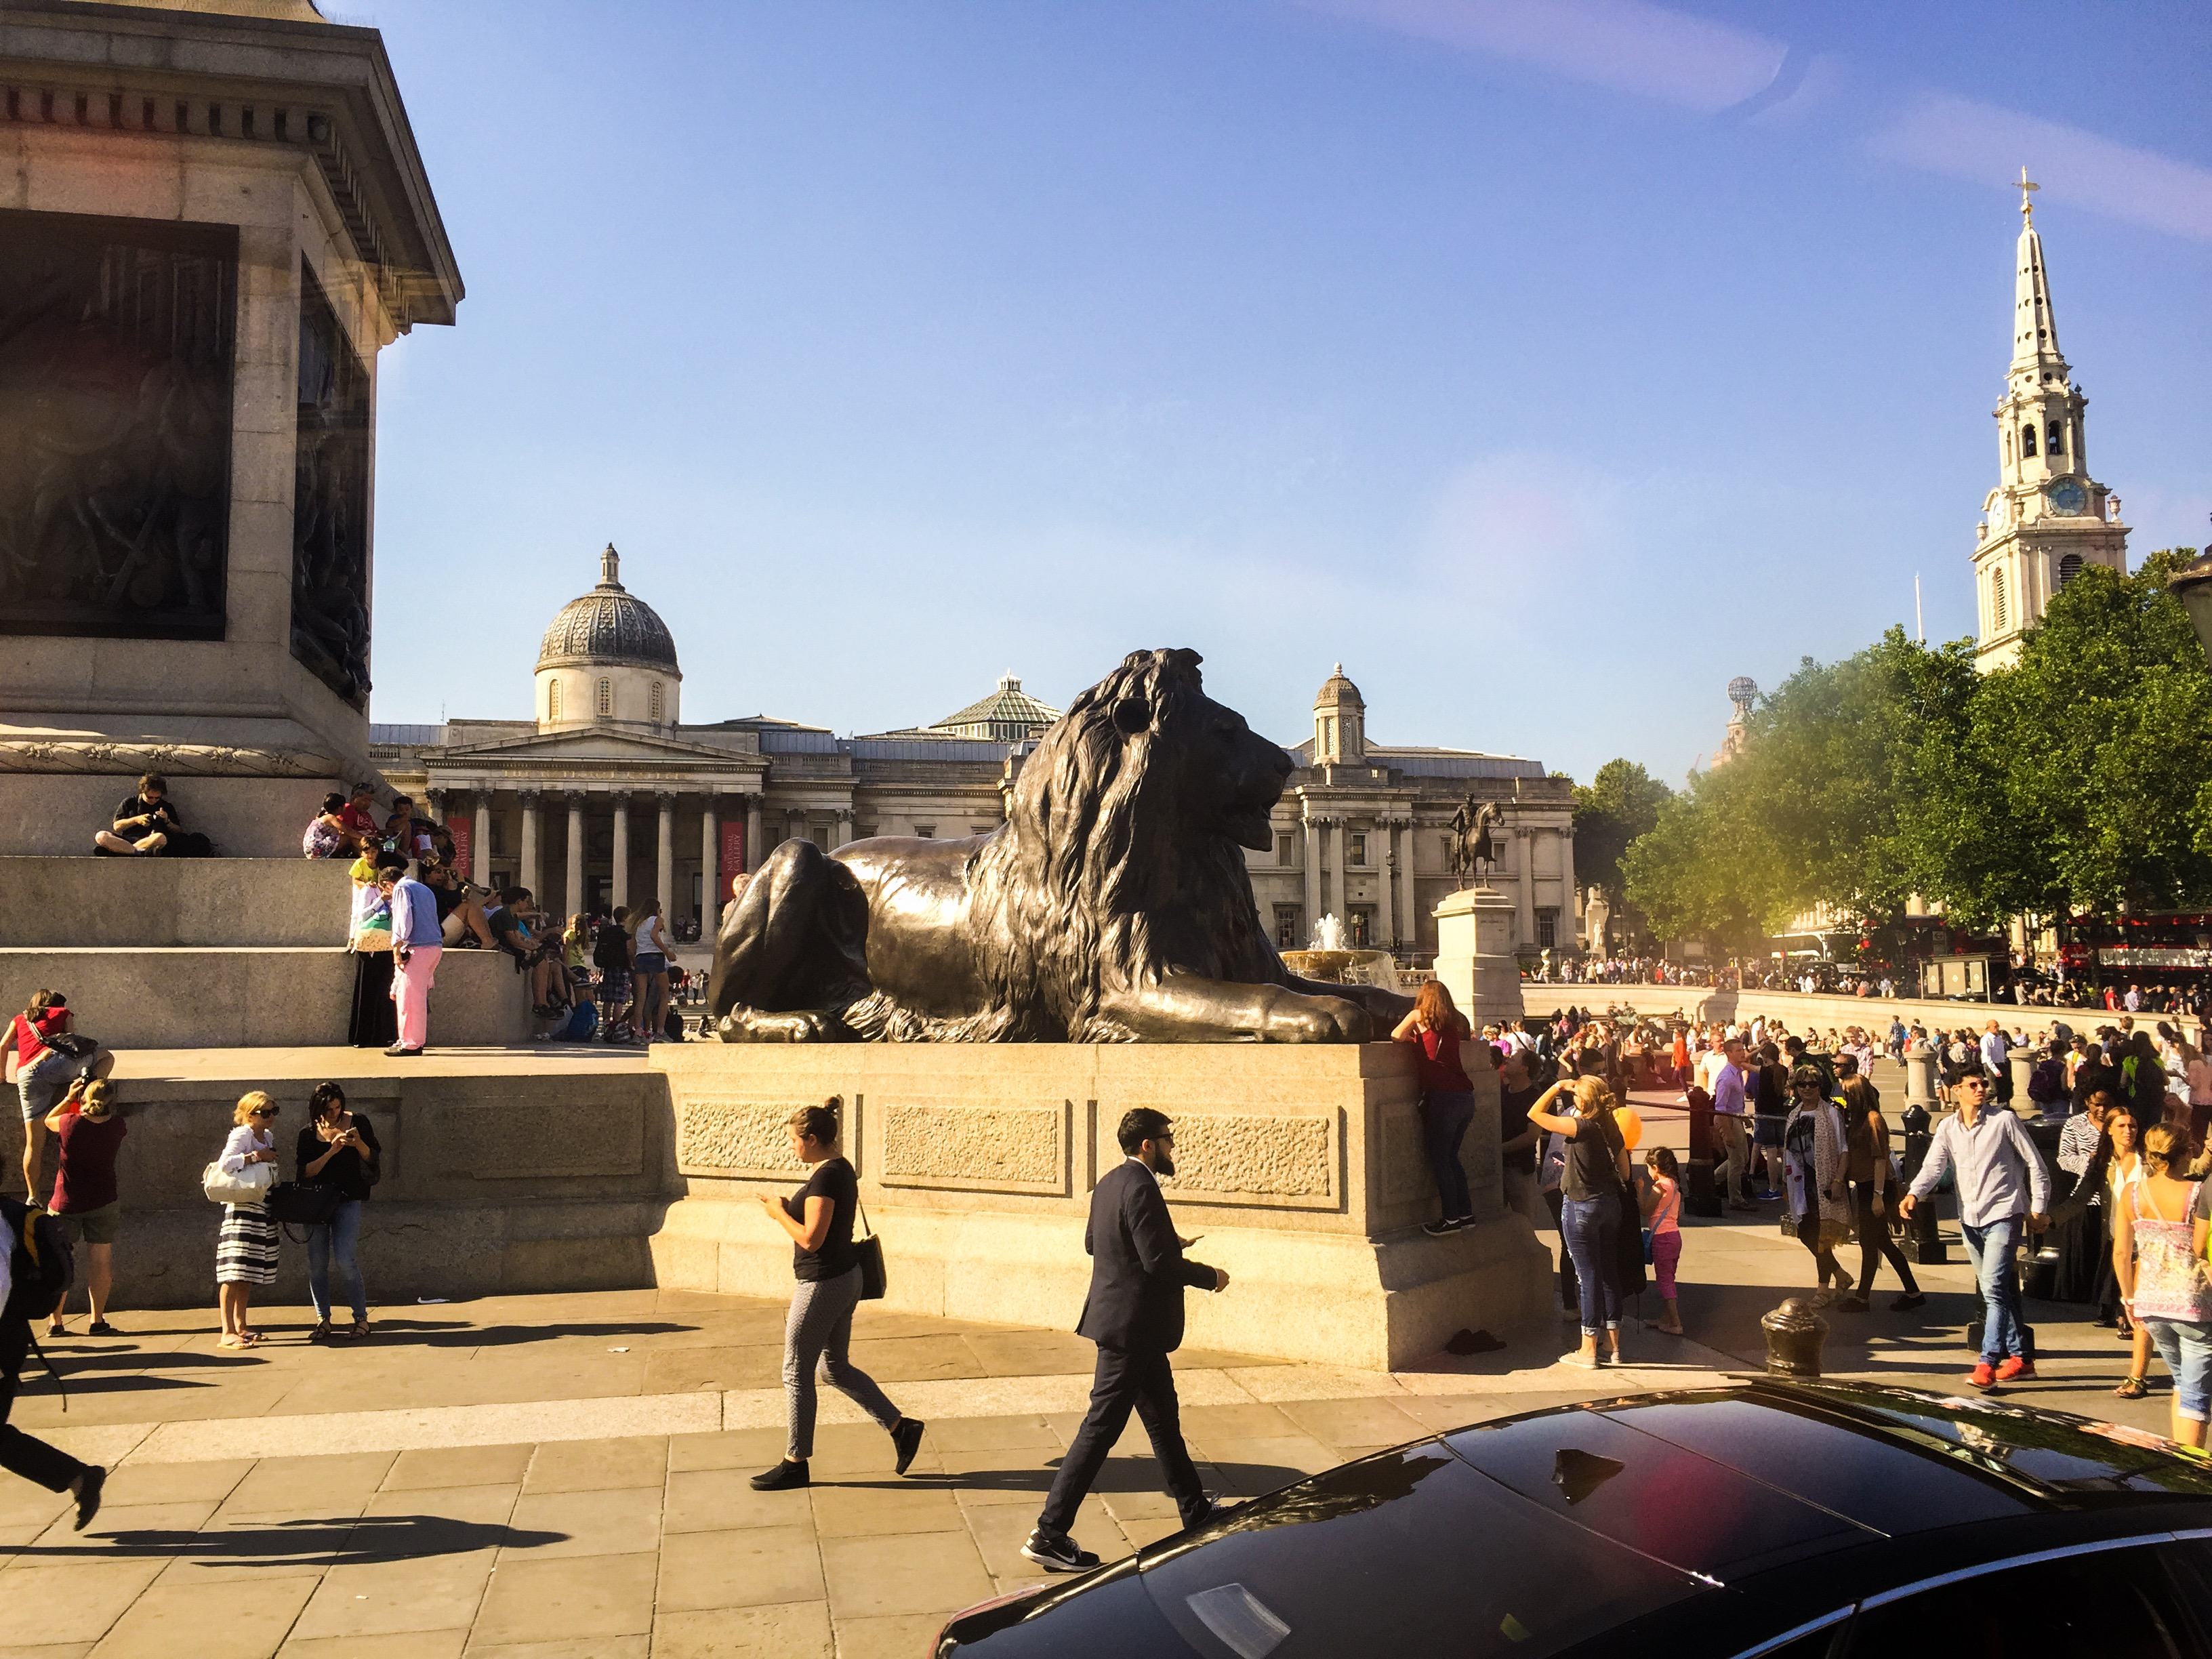 CAPAStudyAbroad_London_Summer2015_From_Sawyer_Coffey_-_Trafalgar_Square